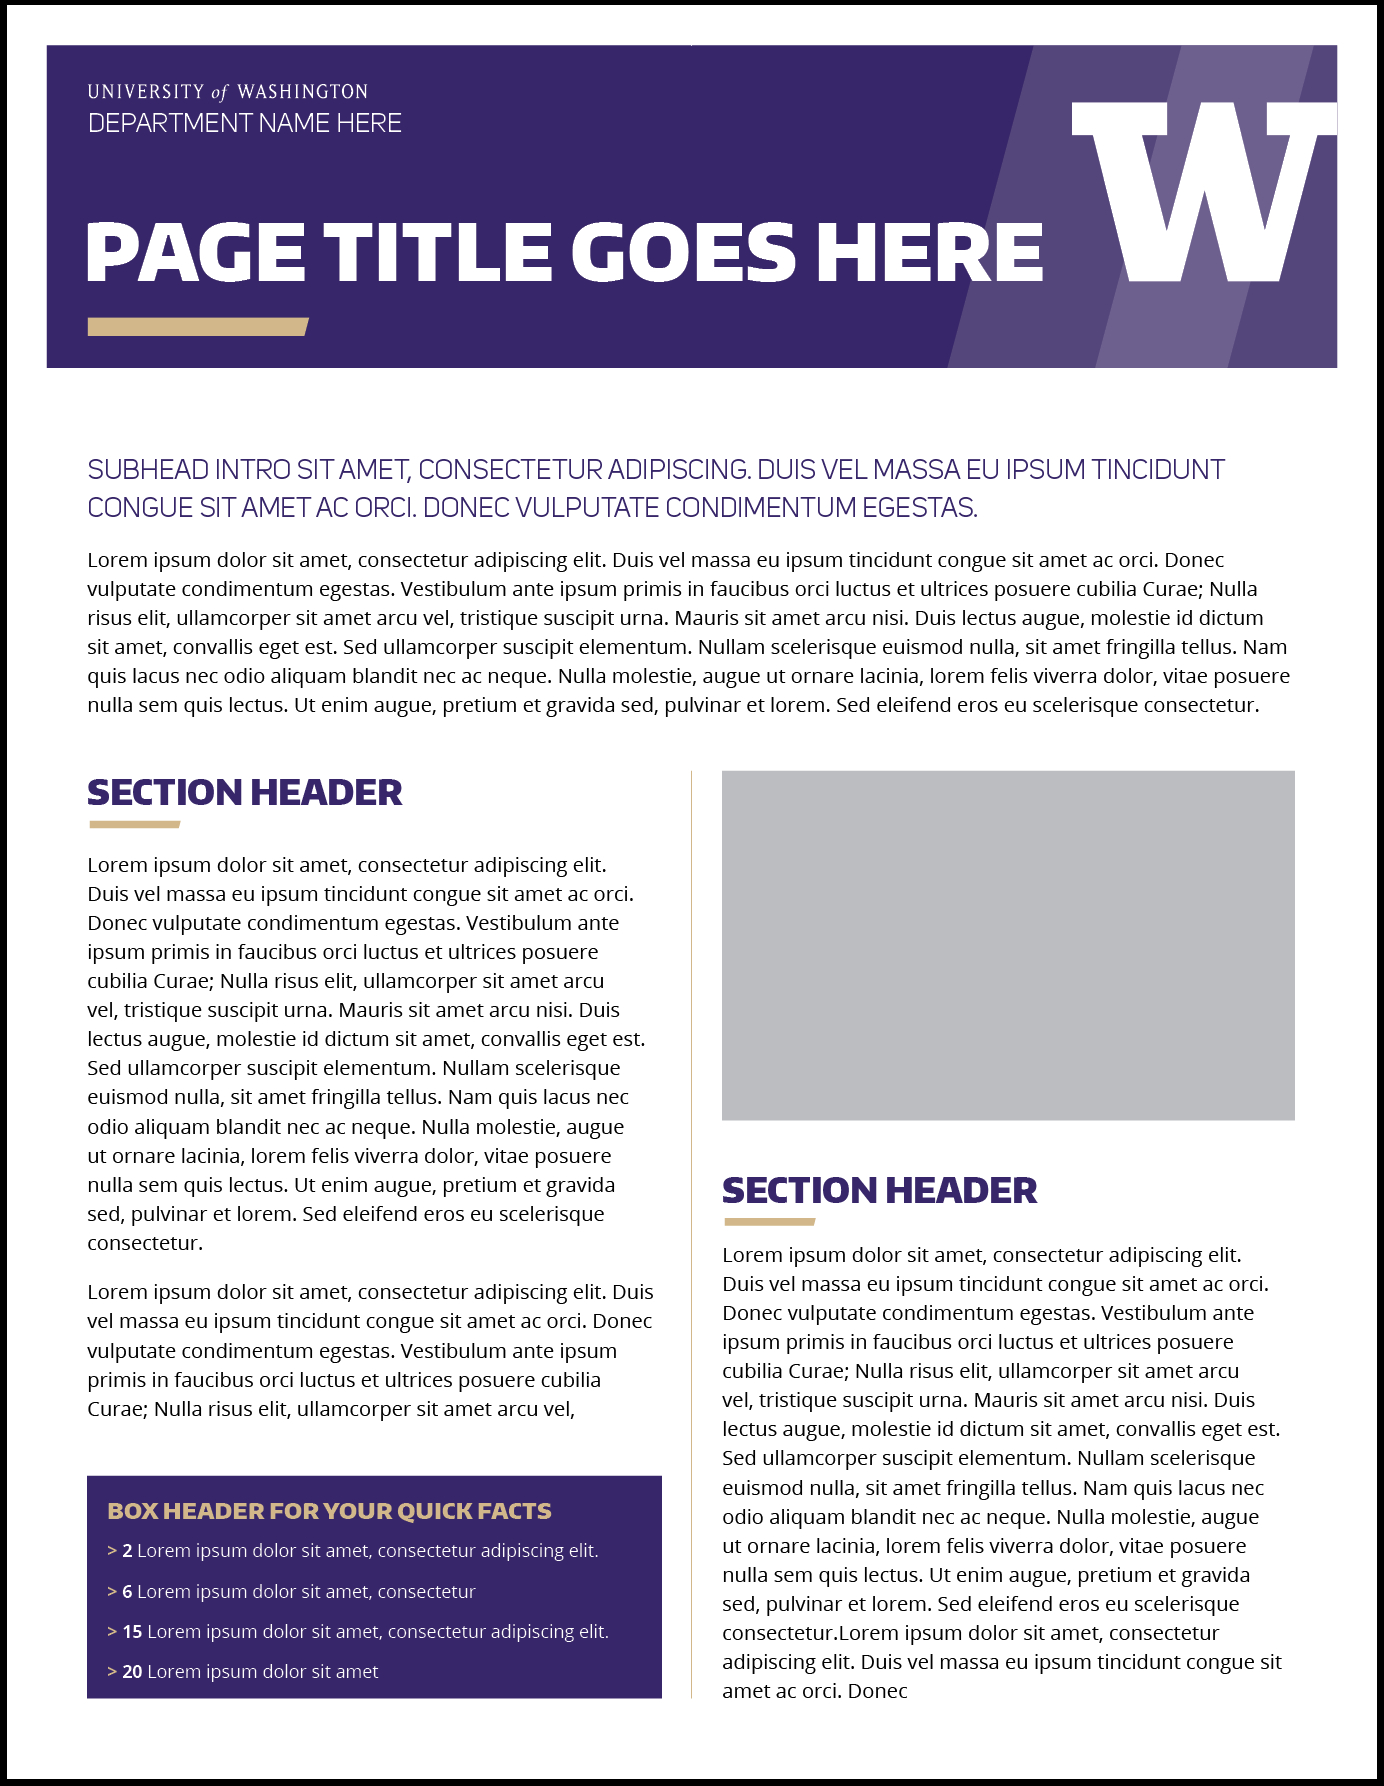 Fact Sheet | Uw Brand In Fact Card Template